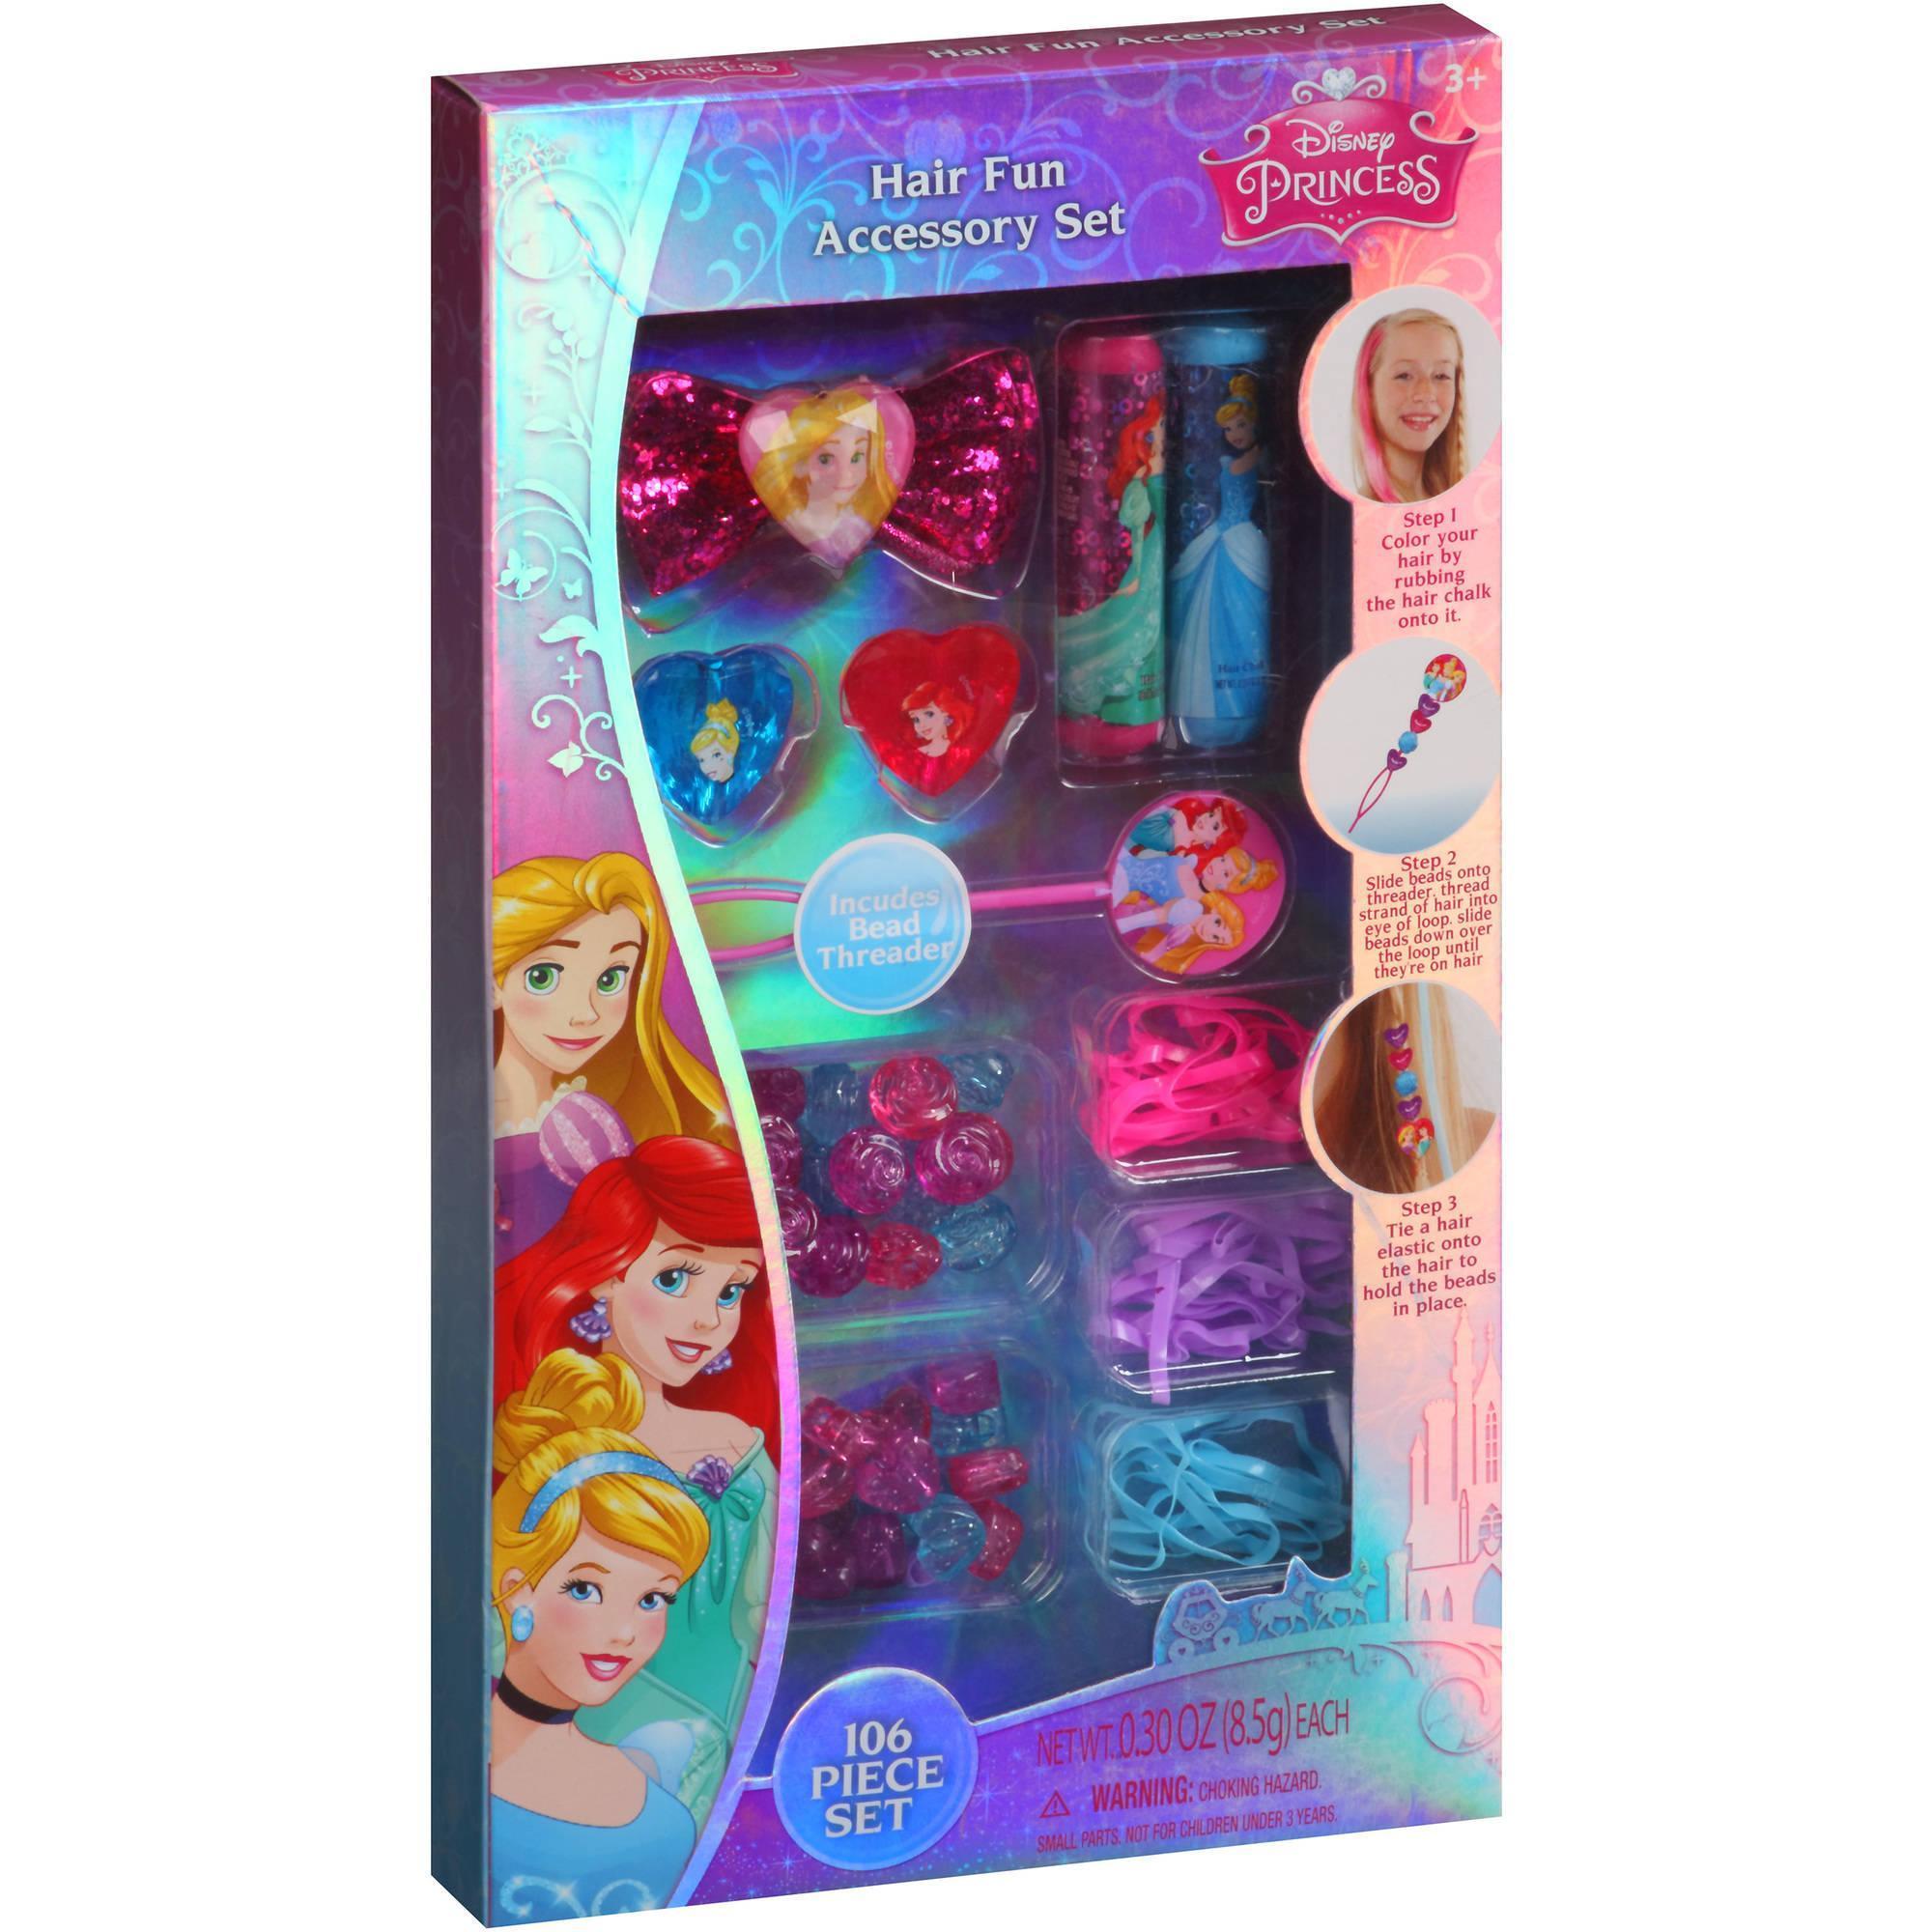 Disney Princess Hair Fun Accessory Set Just $2.44 Down From $4.88 At Walmart!